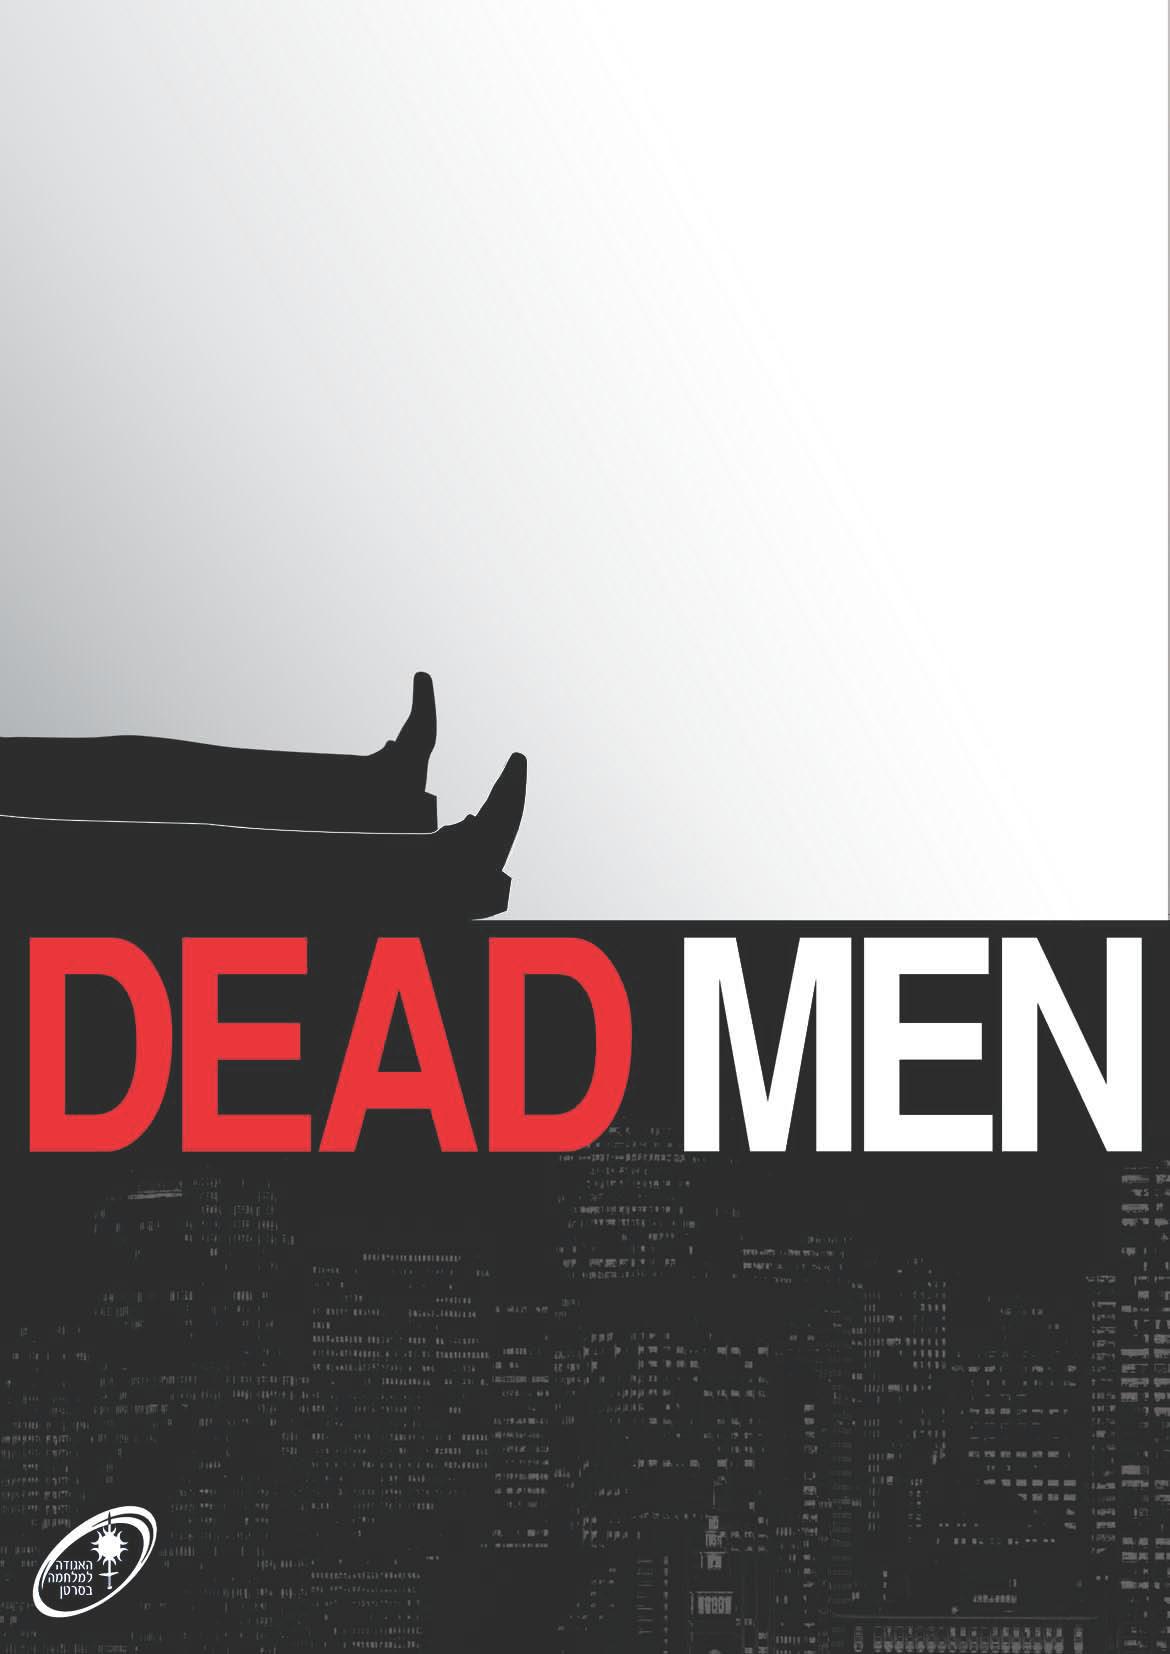 Dead Men - גיתם BBDO מתוך דג הזהב 2011